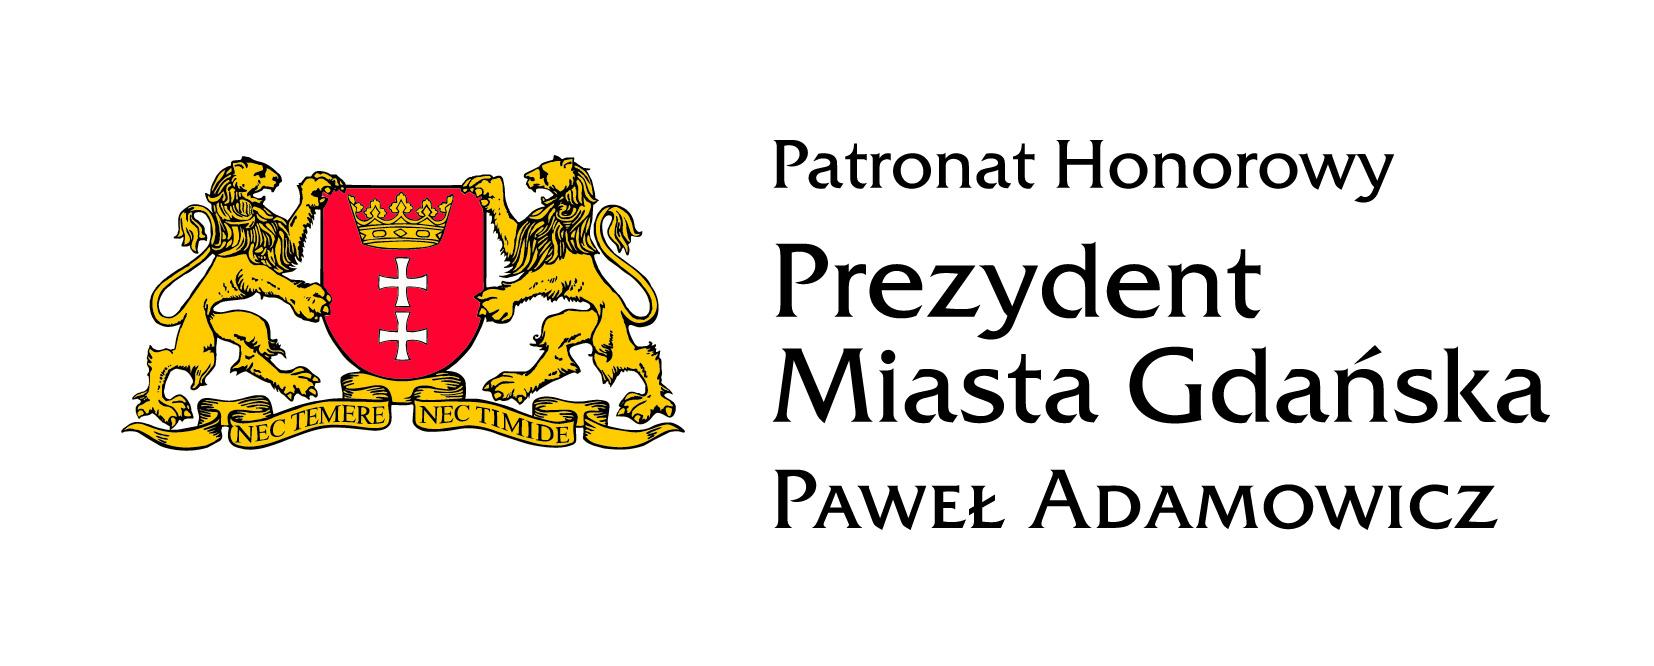 Patronat Honorowy Prezydenta Miasta Gdańska.jpg